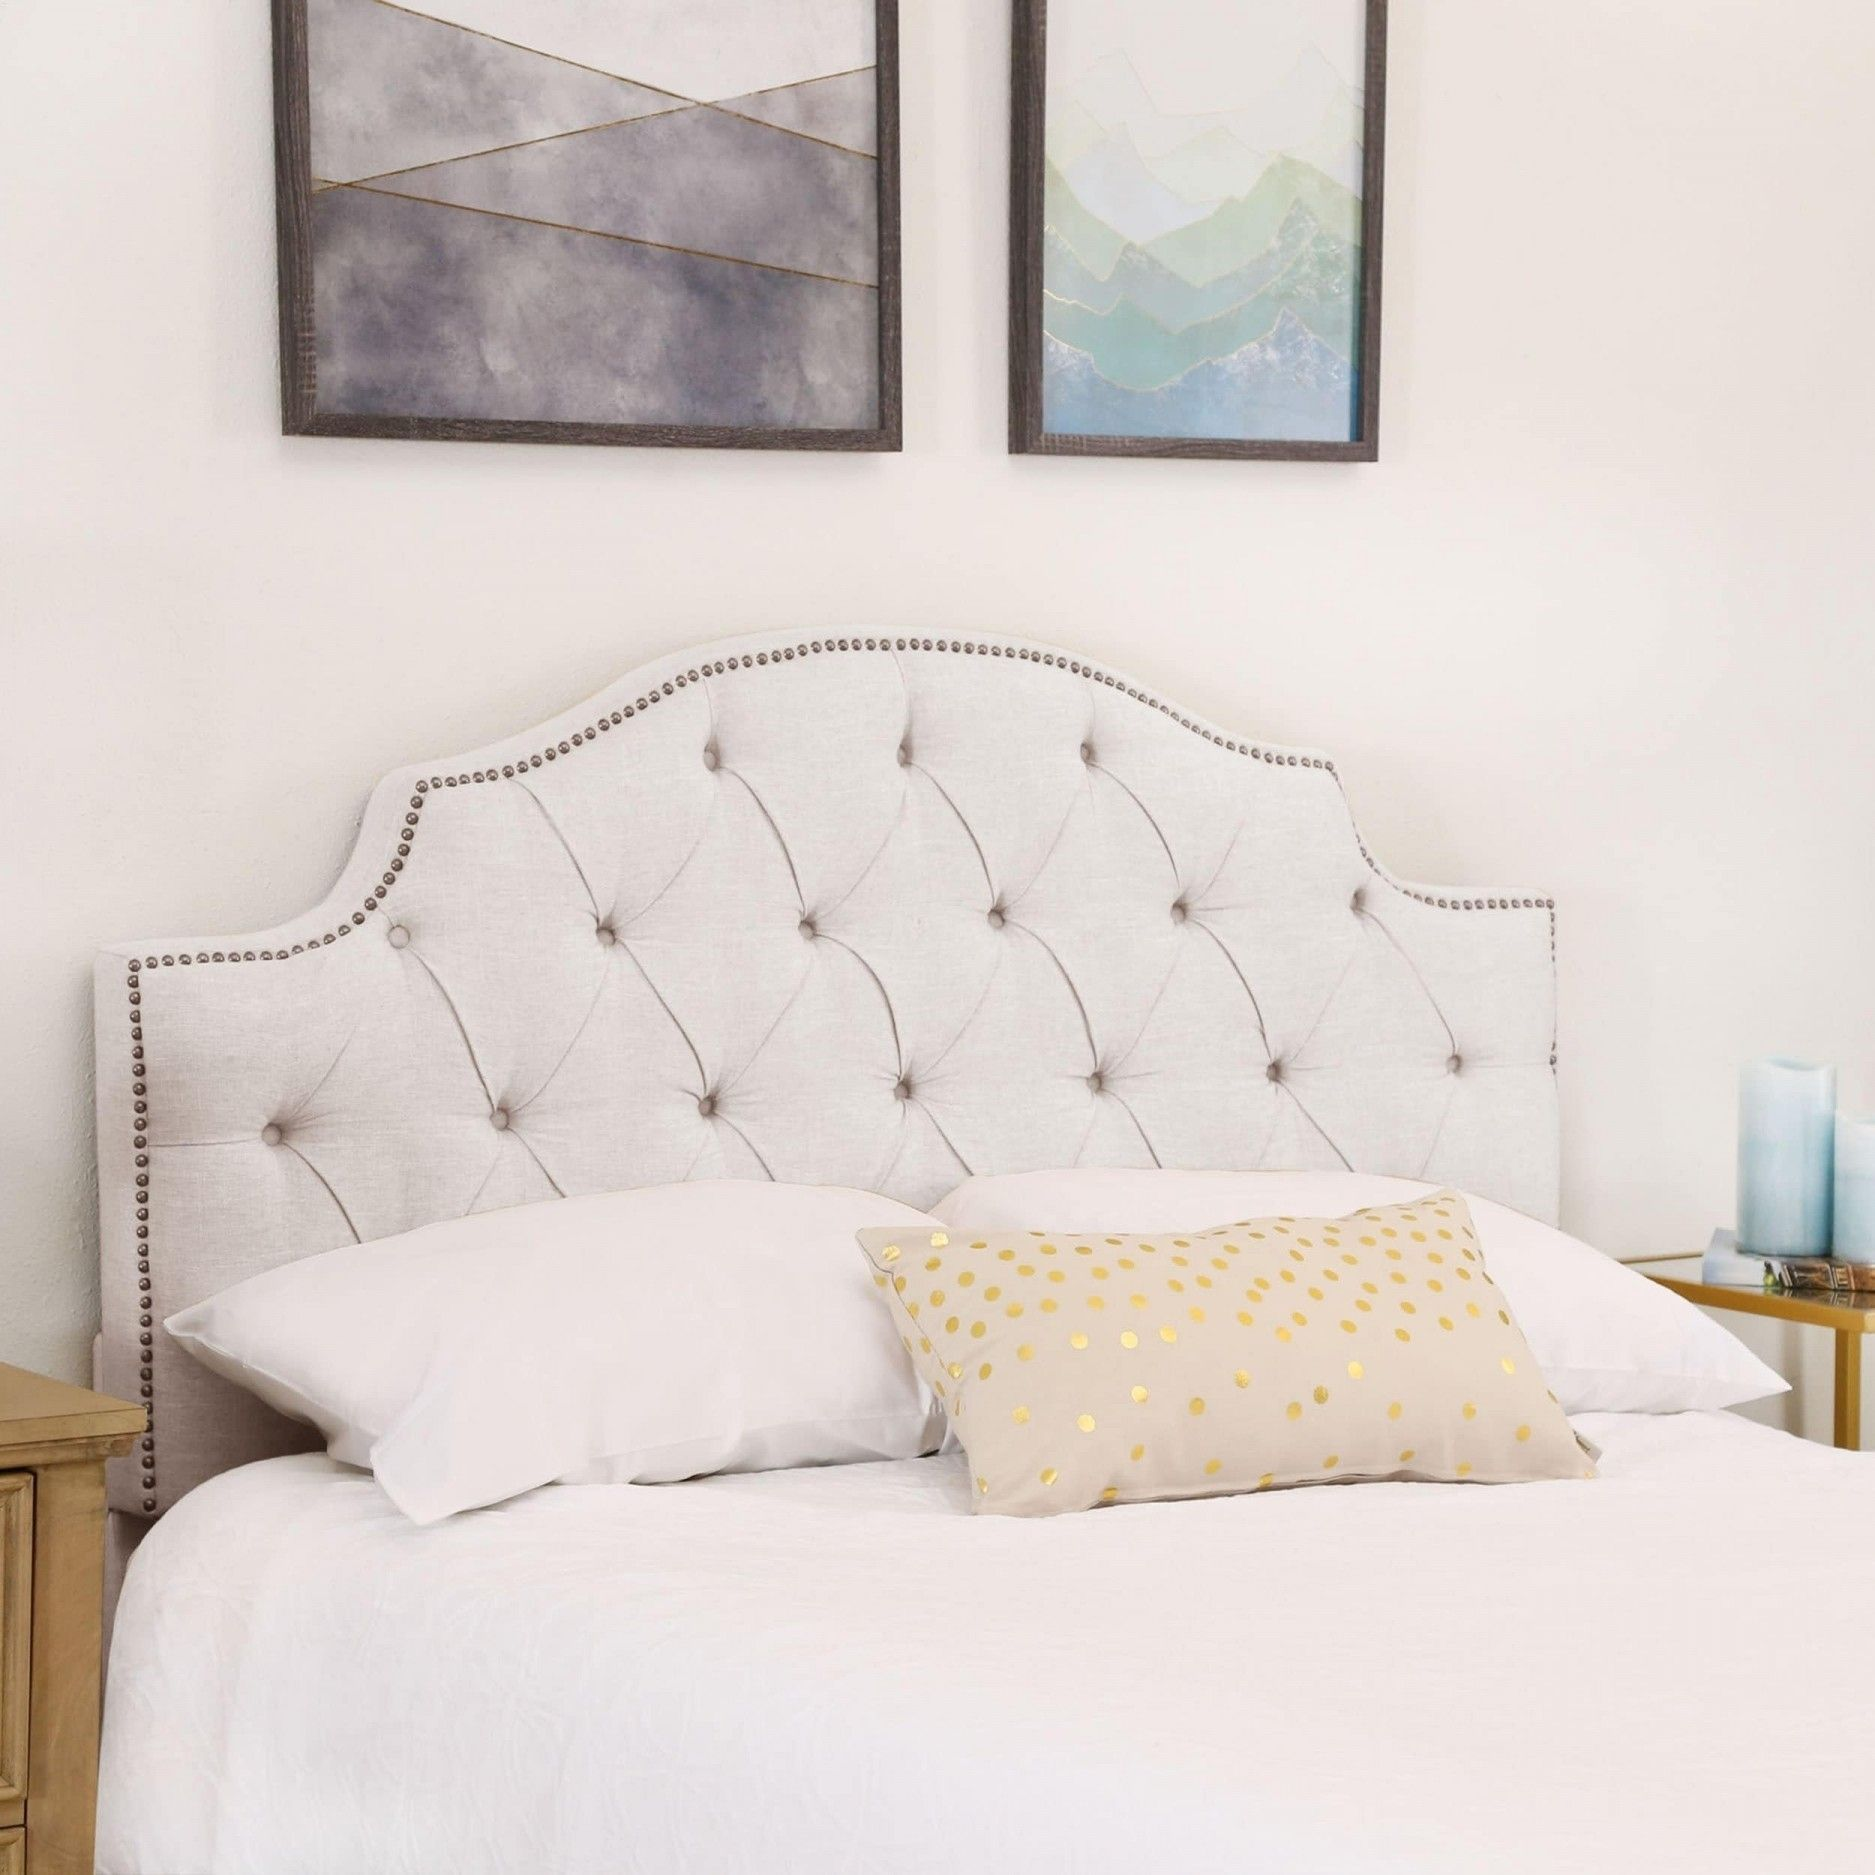 Elegant White Headboard In 2020 White Headboard Bed Linen